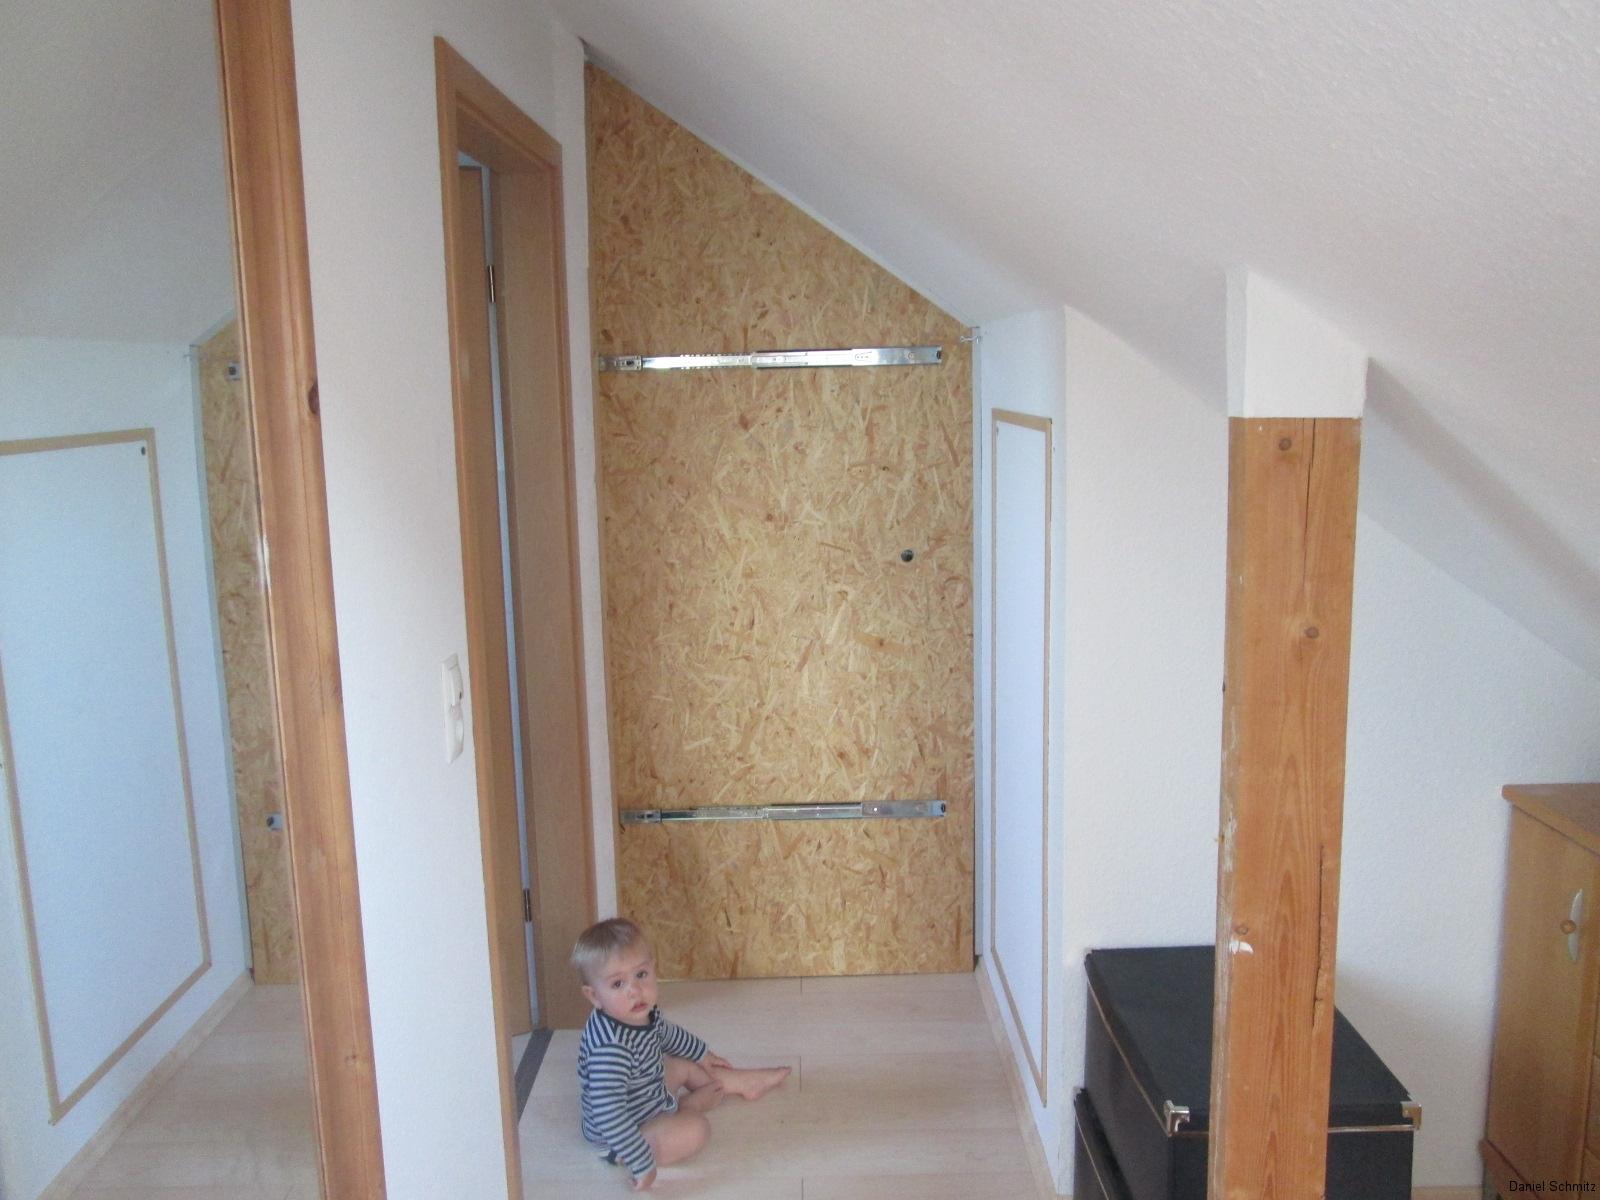 dachbodenausbau daniel schmitz. Black Bedroom Furniture Sets. Home Design Ideas